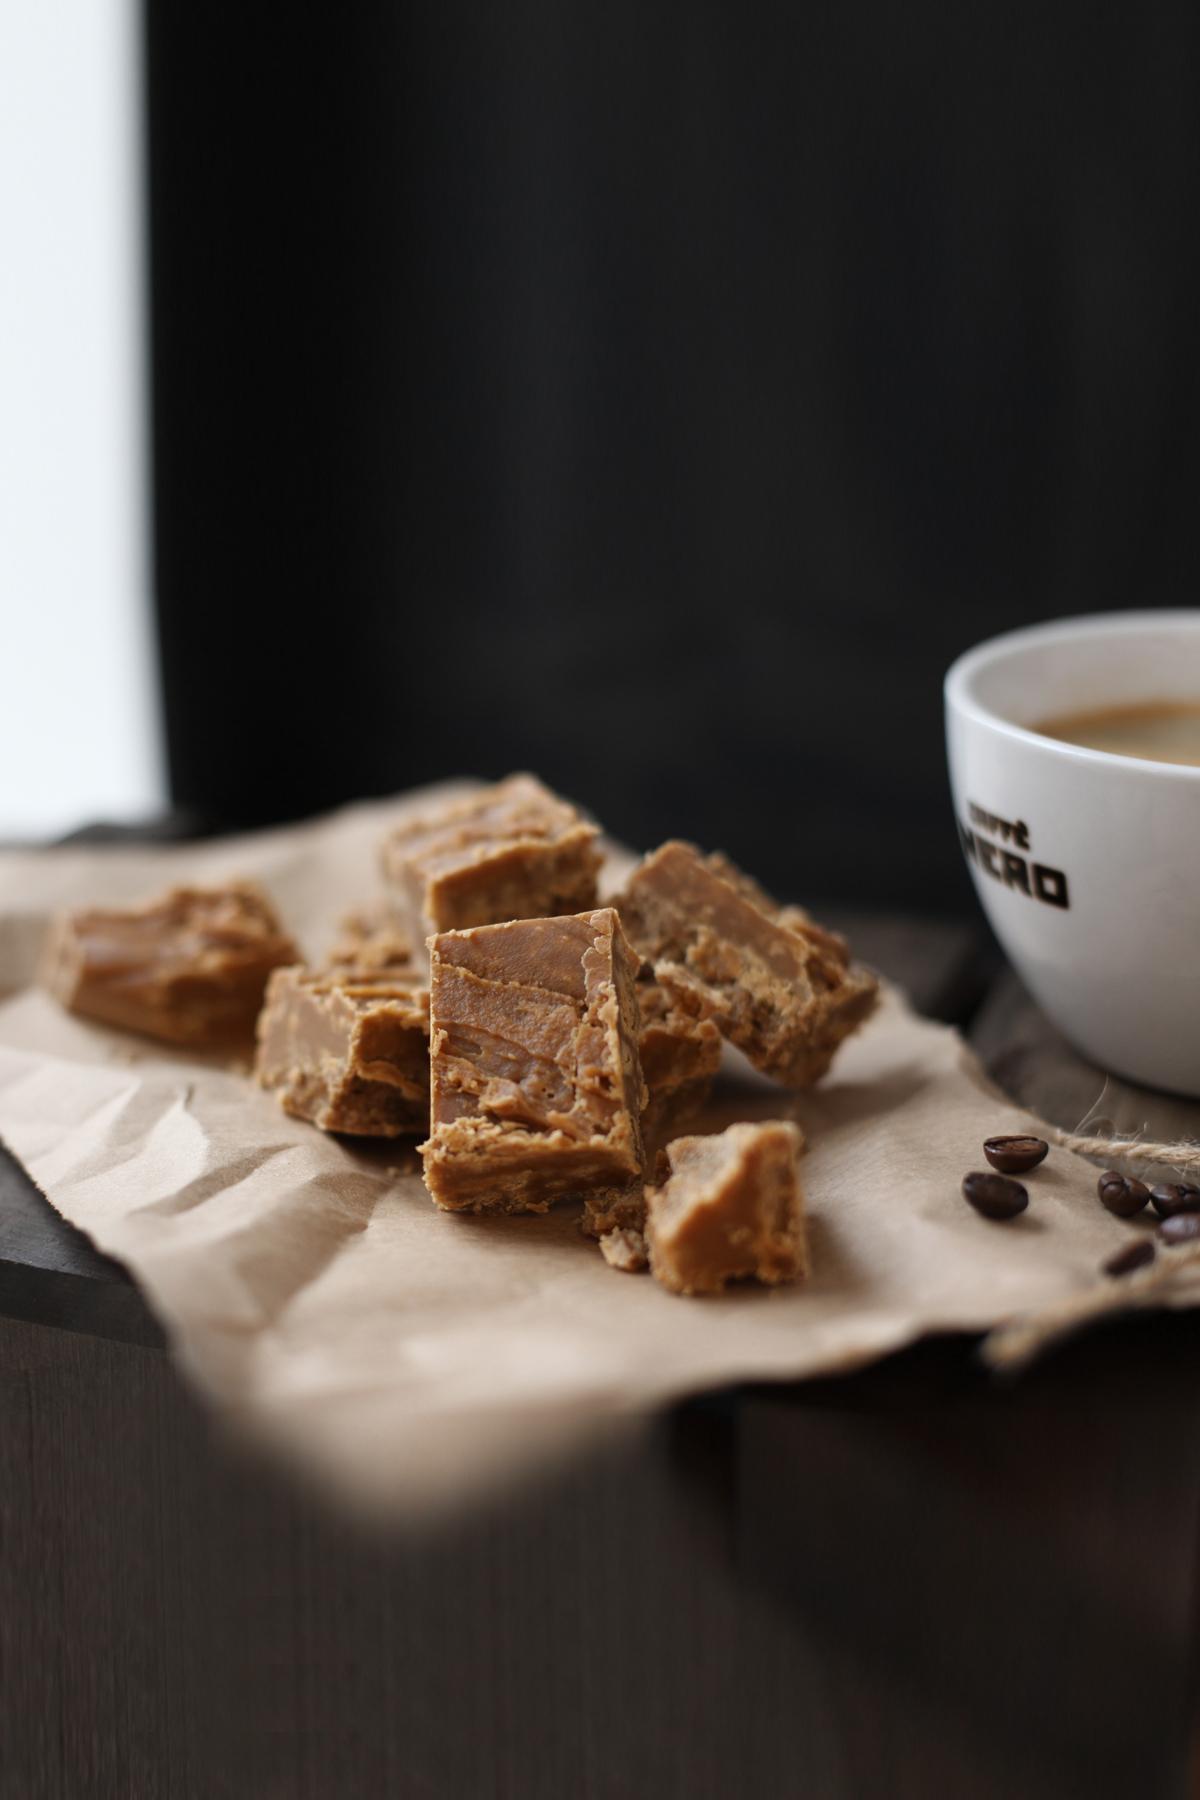 Free porridge when you buy a coffee through Caffe Nero app